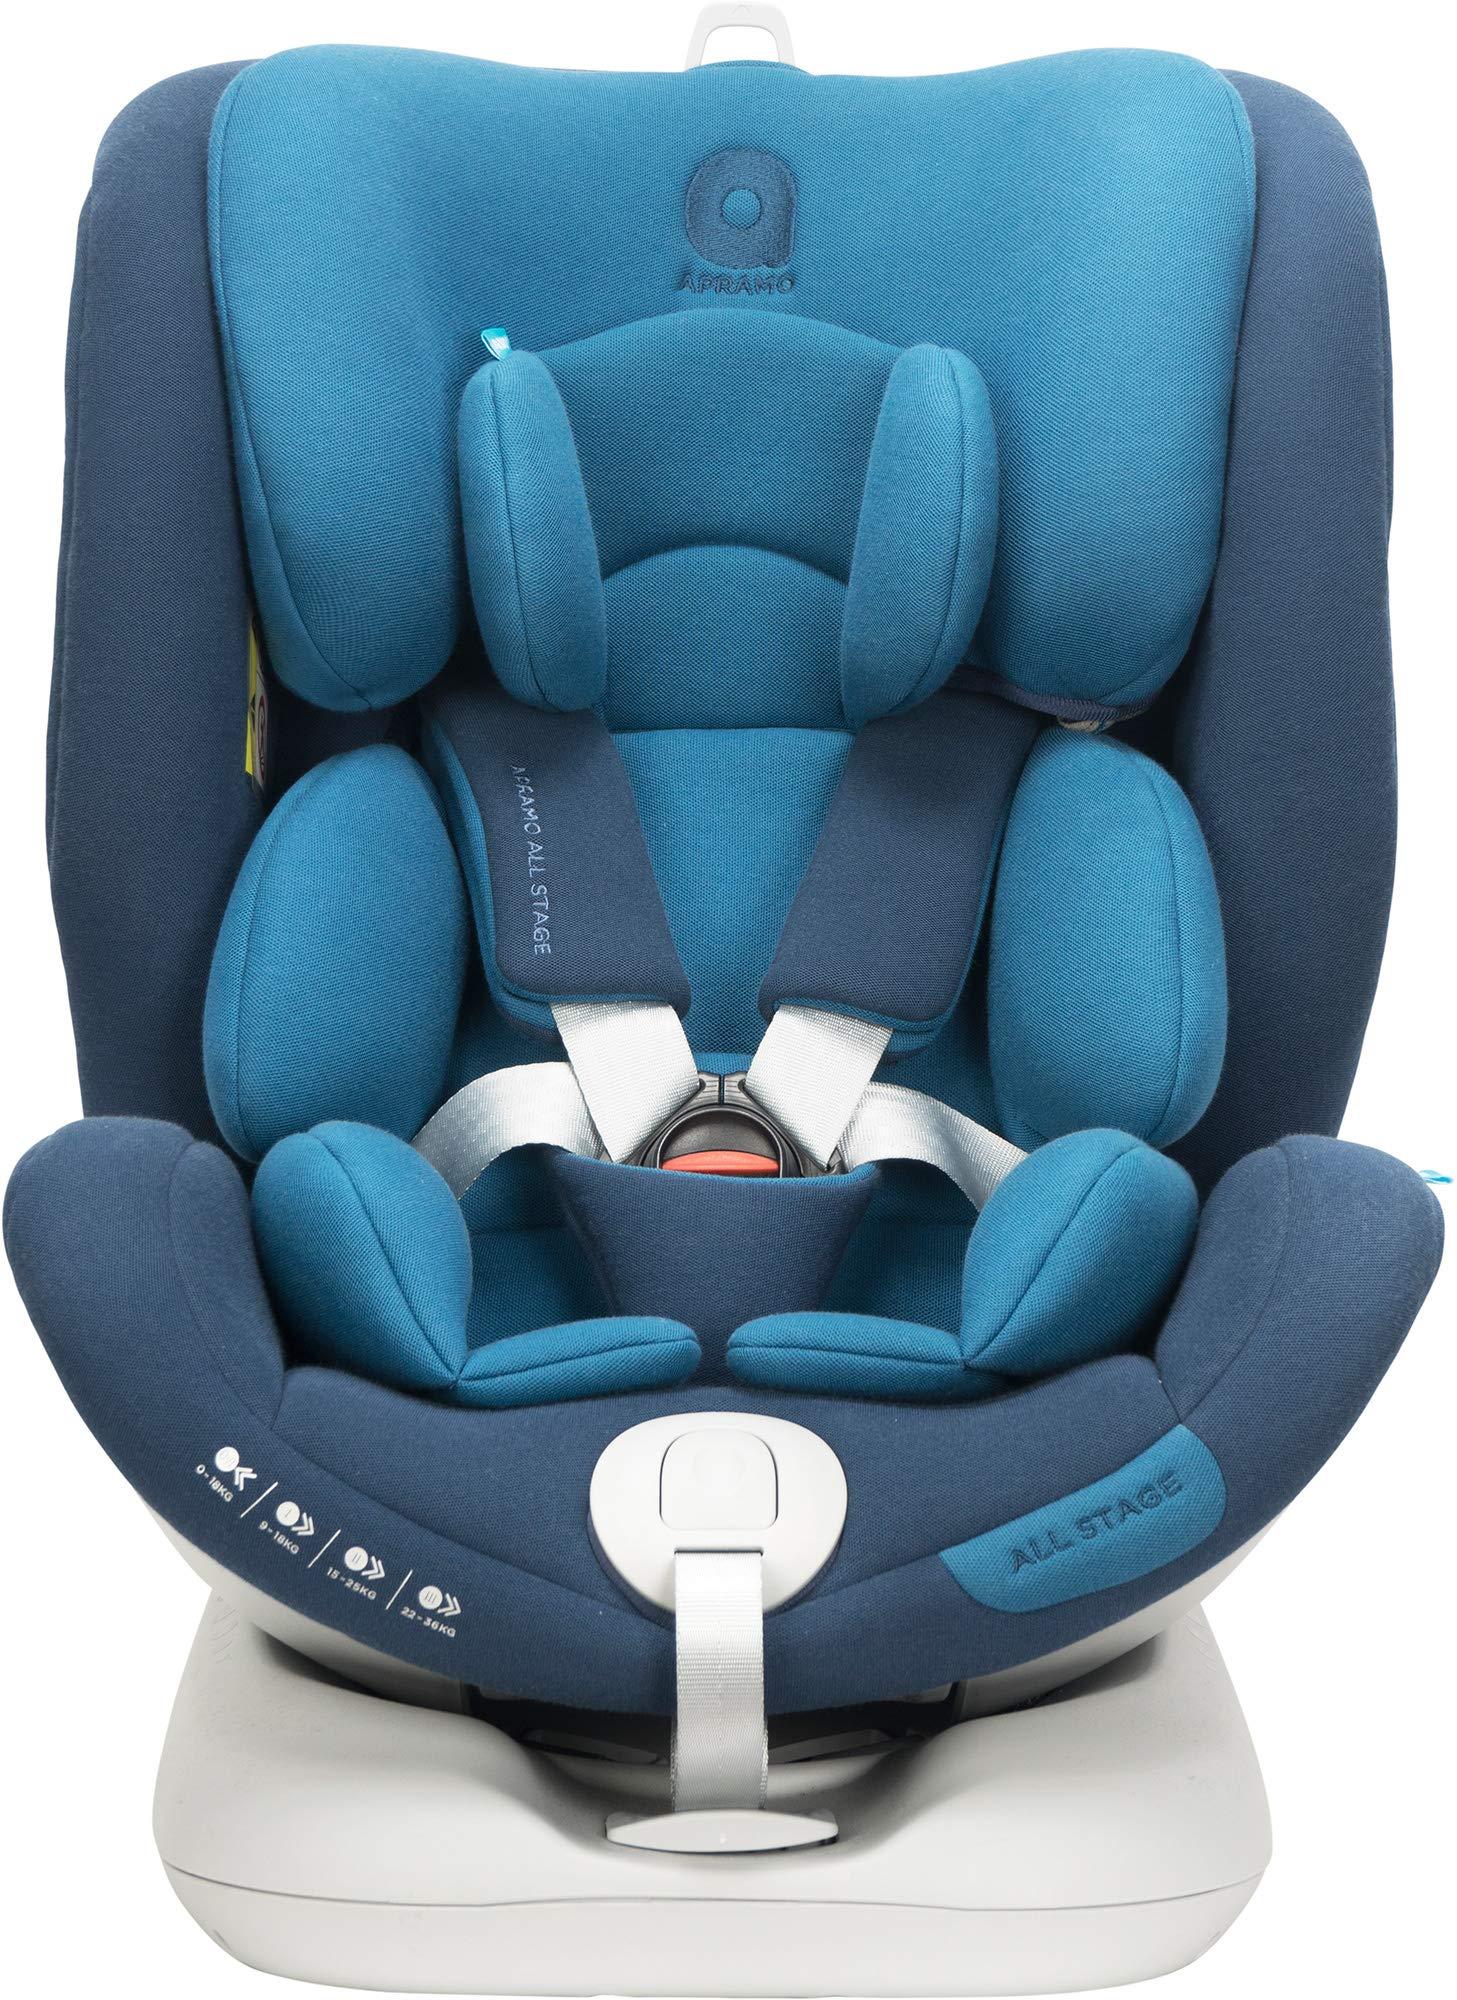 Apramo All Stage Child Car Seat Group 0+/1/2/3 Royal Blue  APRAMO